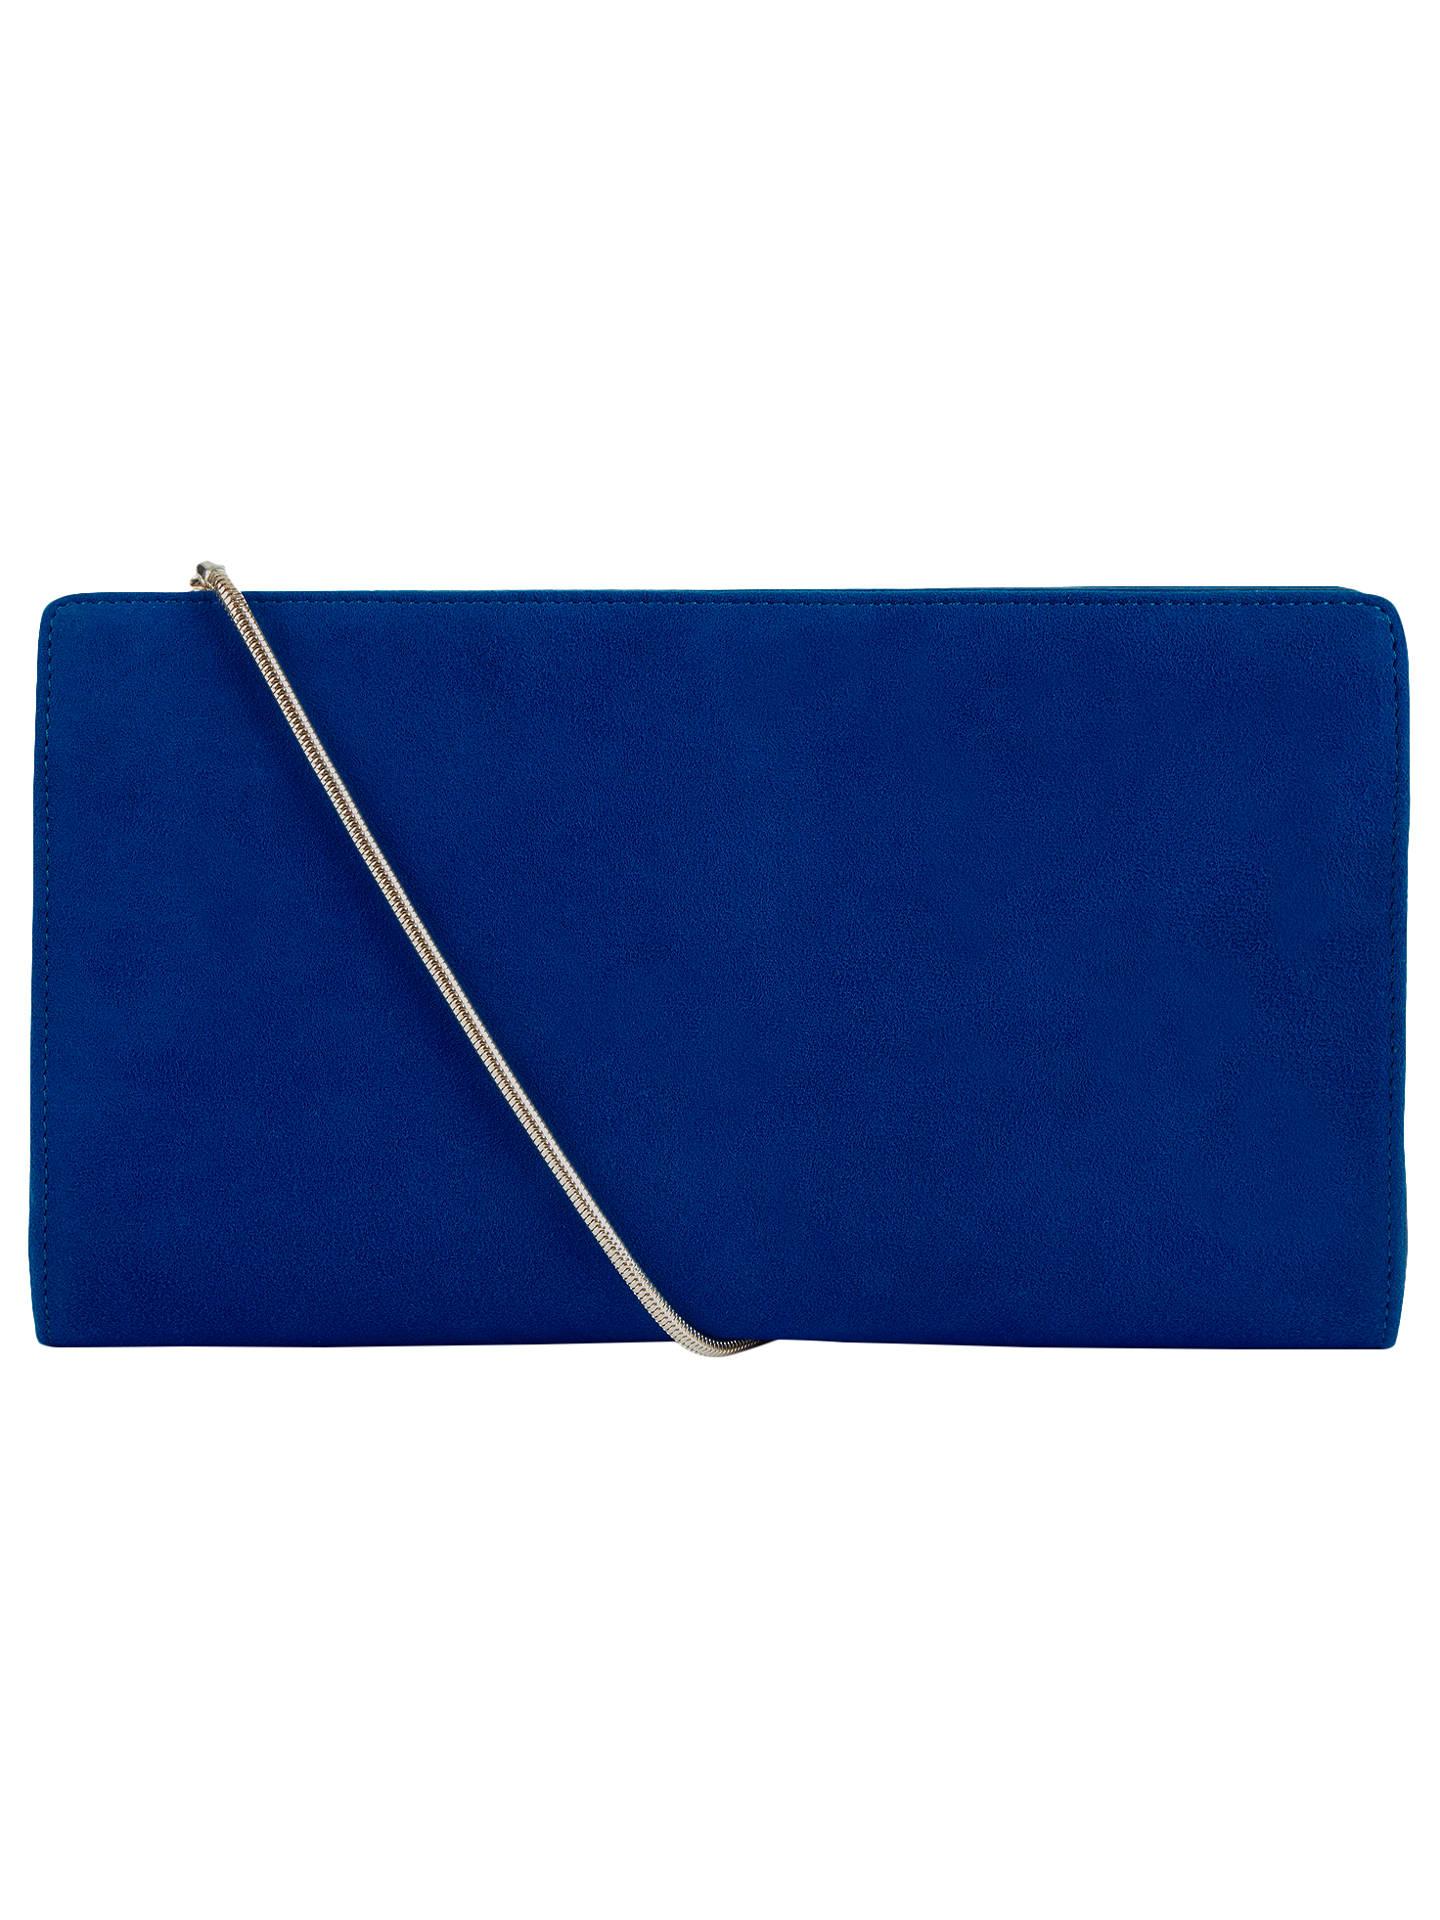 Hobbs Astrid Leather Clutch Bag Cobalt Online At Johnlewis